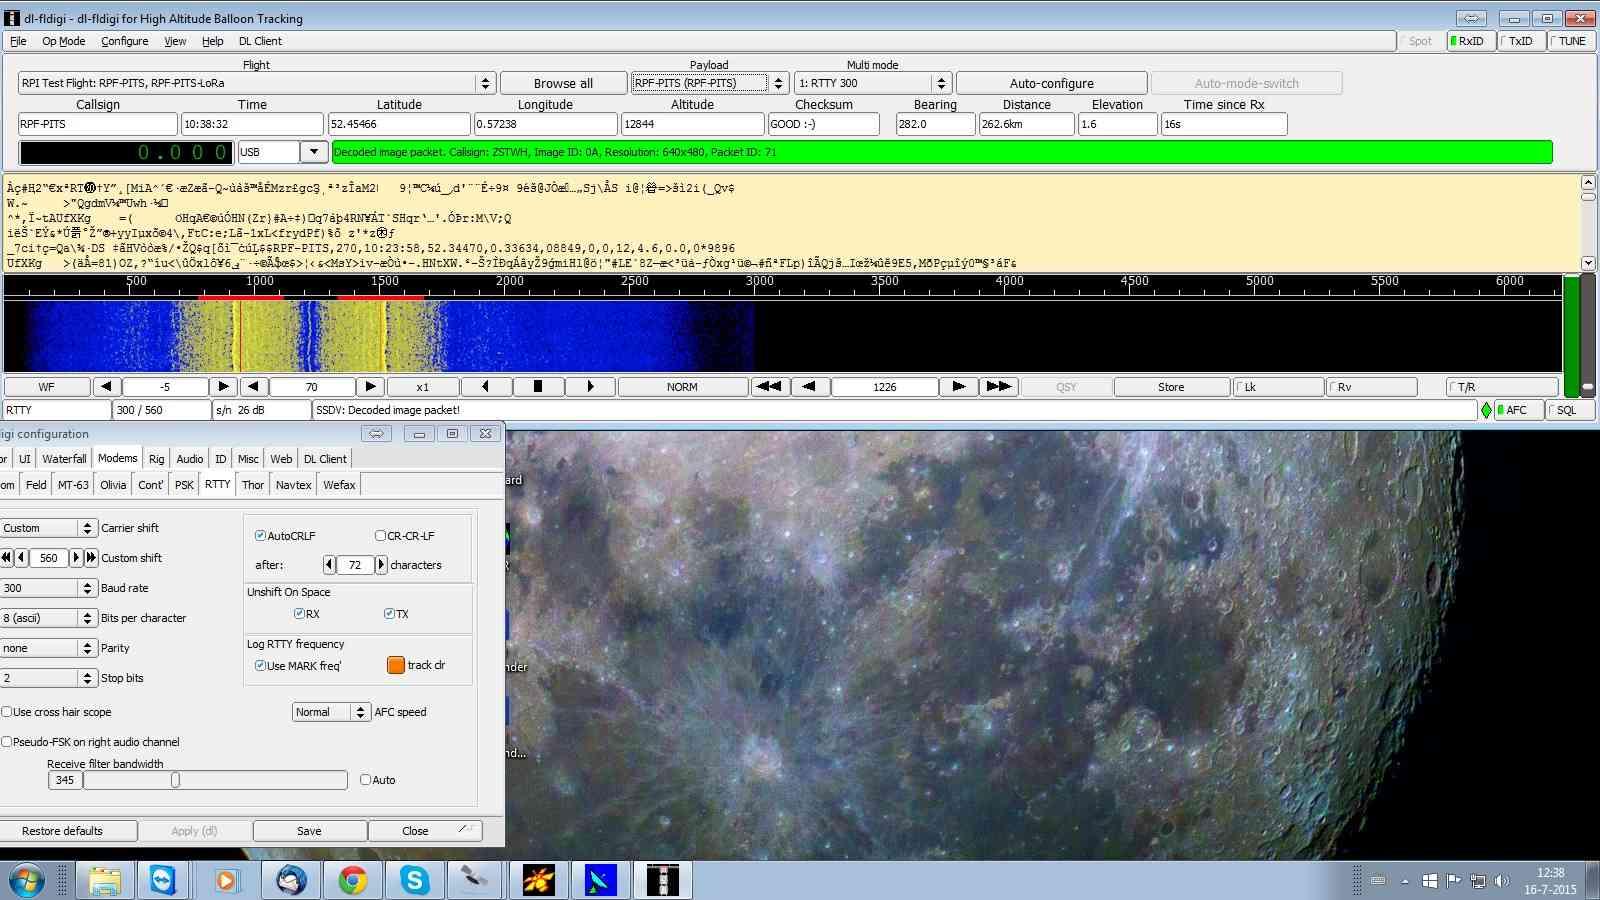 highaltitude log 20150716